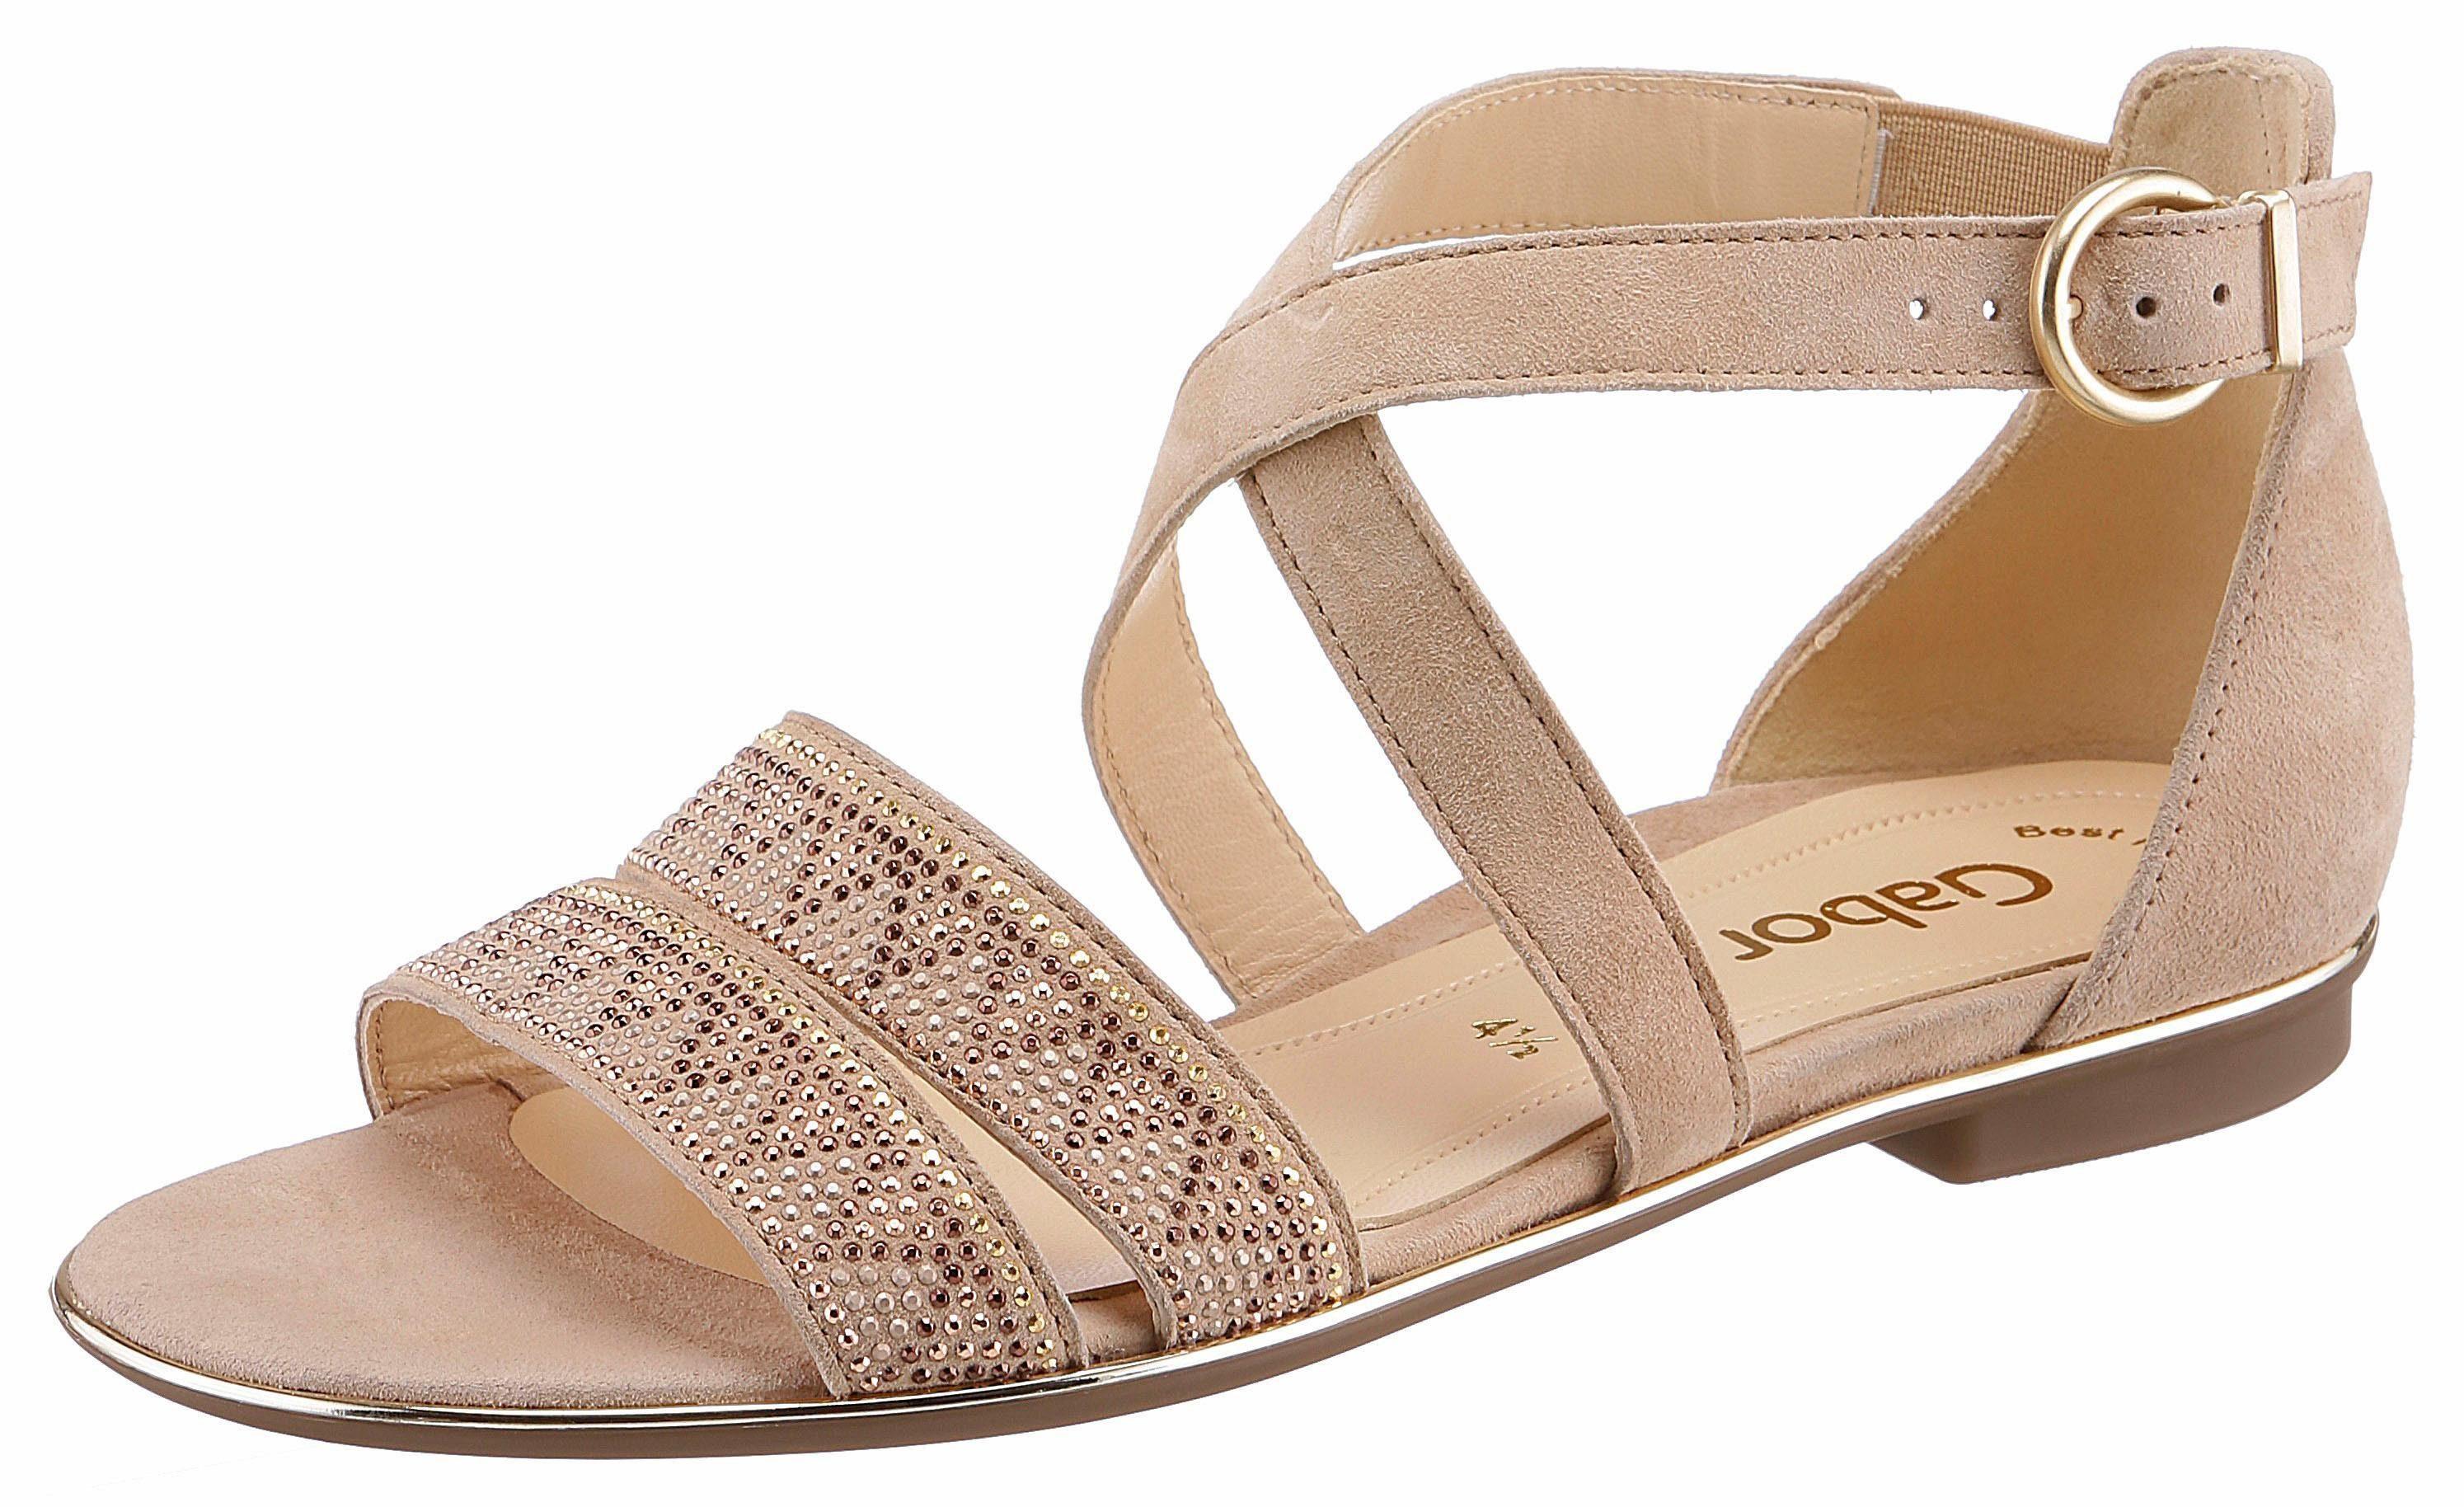 Gabor Sandales De Mode Femmes - Beige - 41 Eu 9fyUgajc